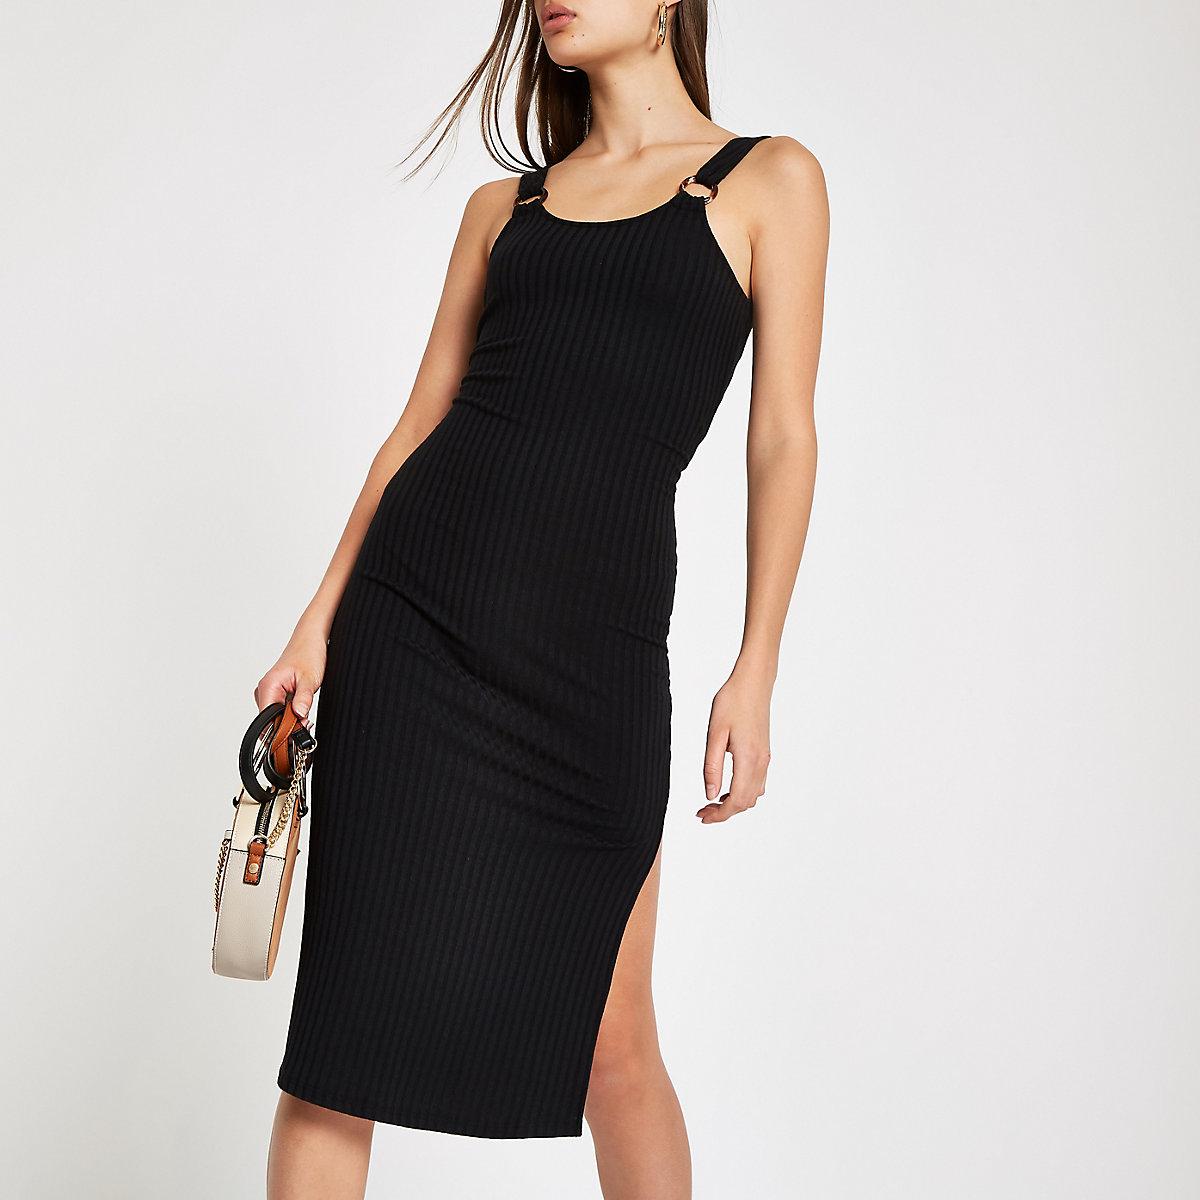 Black ribbed bodycon dress